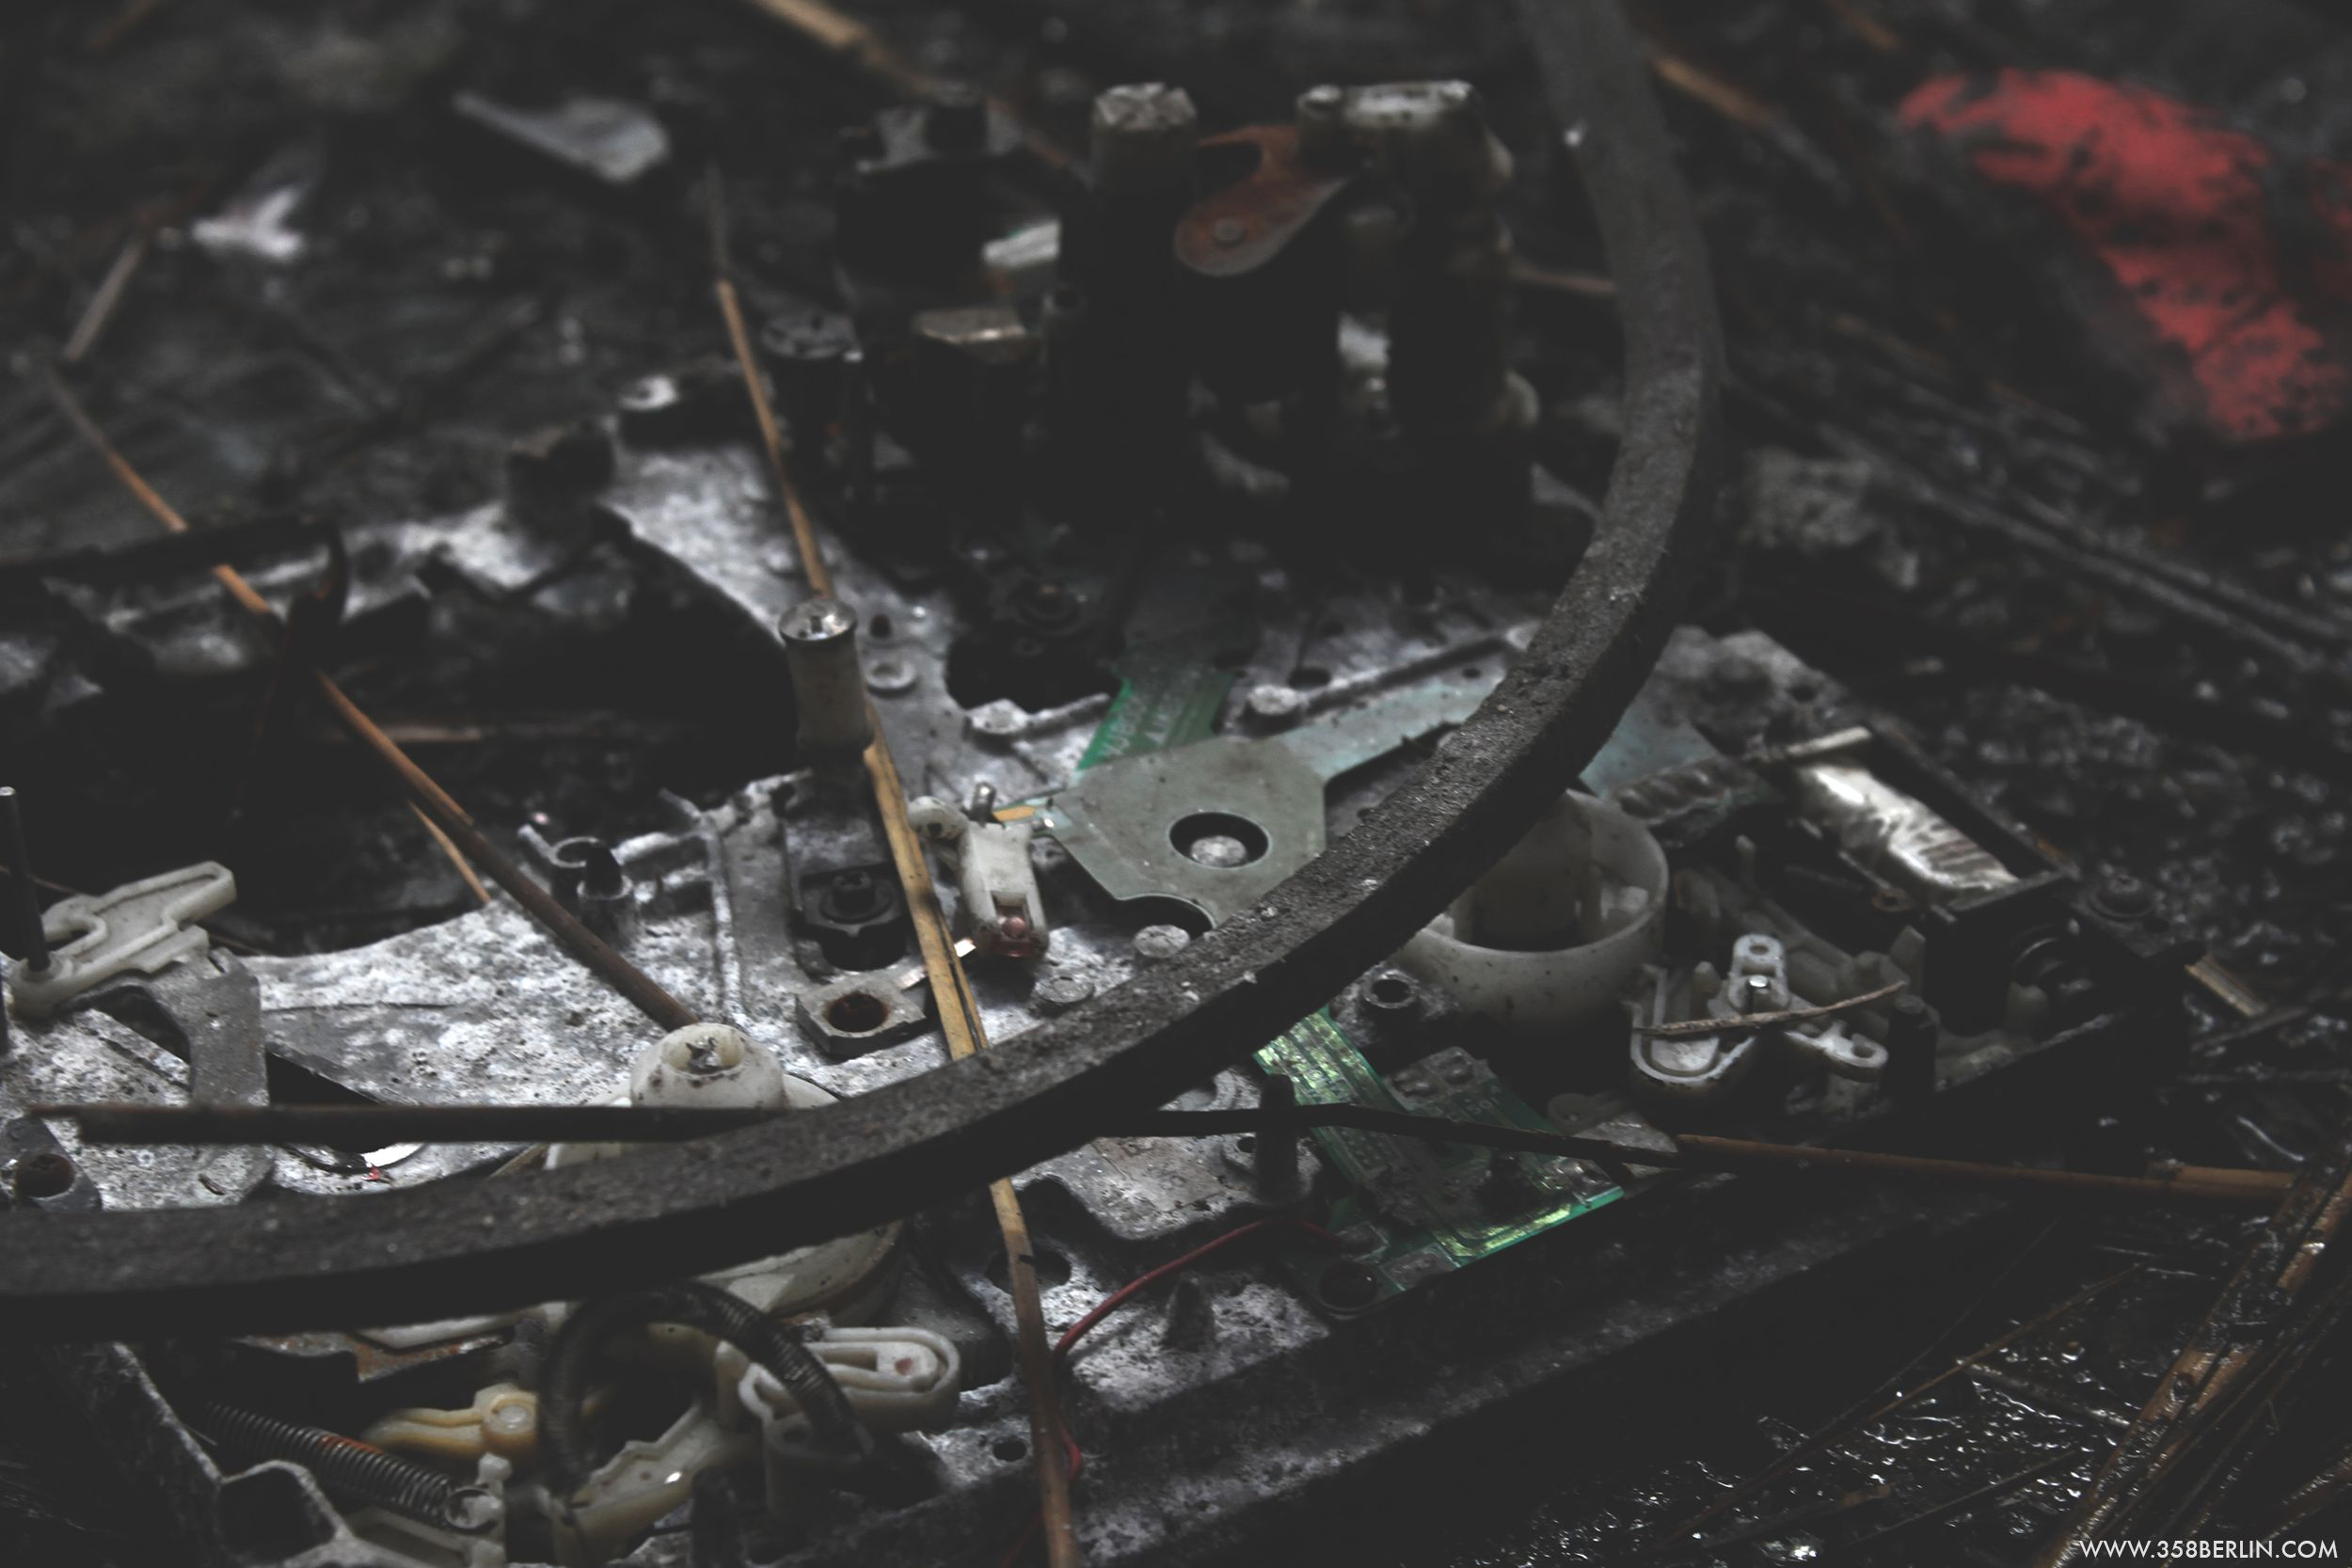 Berlin Blub (abandoned spa) #details #ground #broken #computer #Berlin